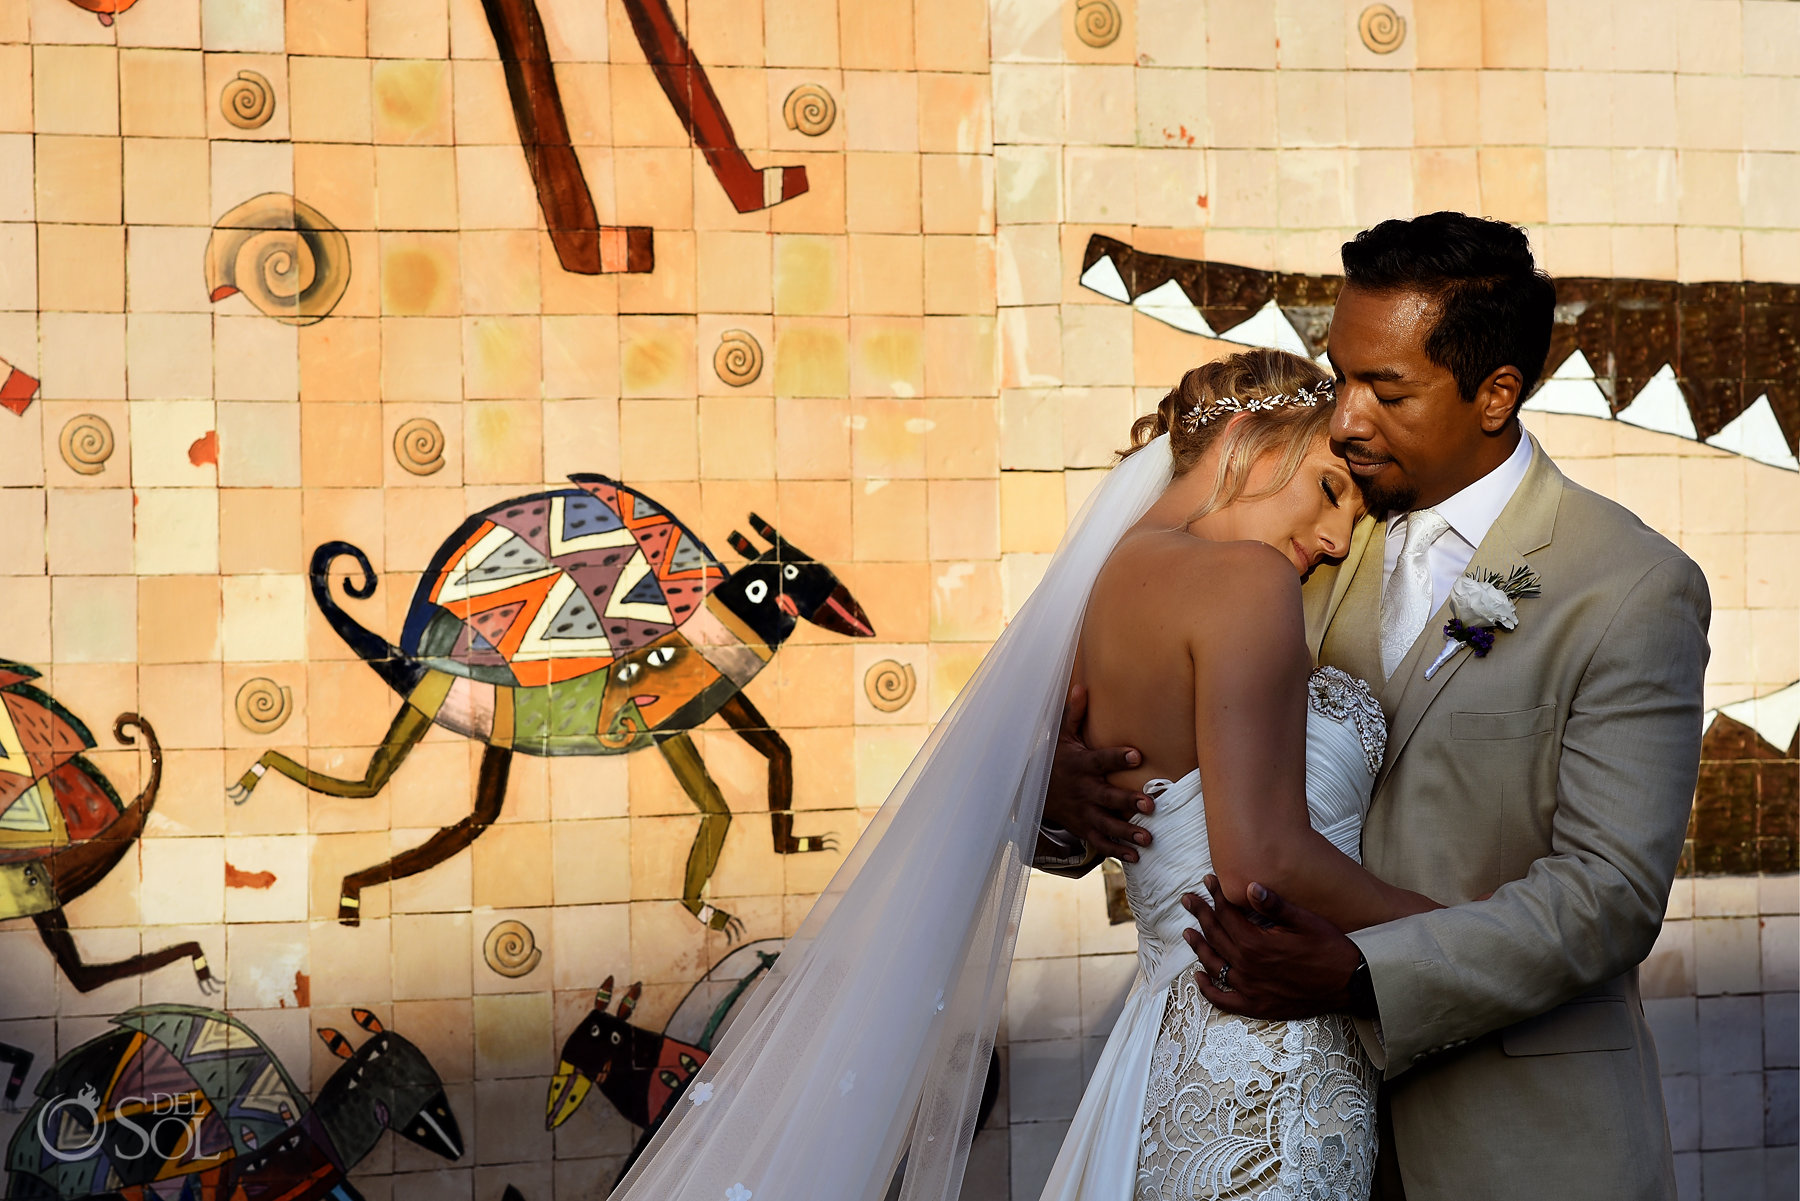 Dreams tulum sunset wedding portrait beside mosaic mural wall